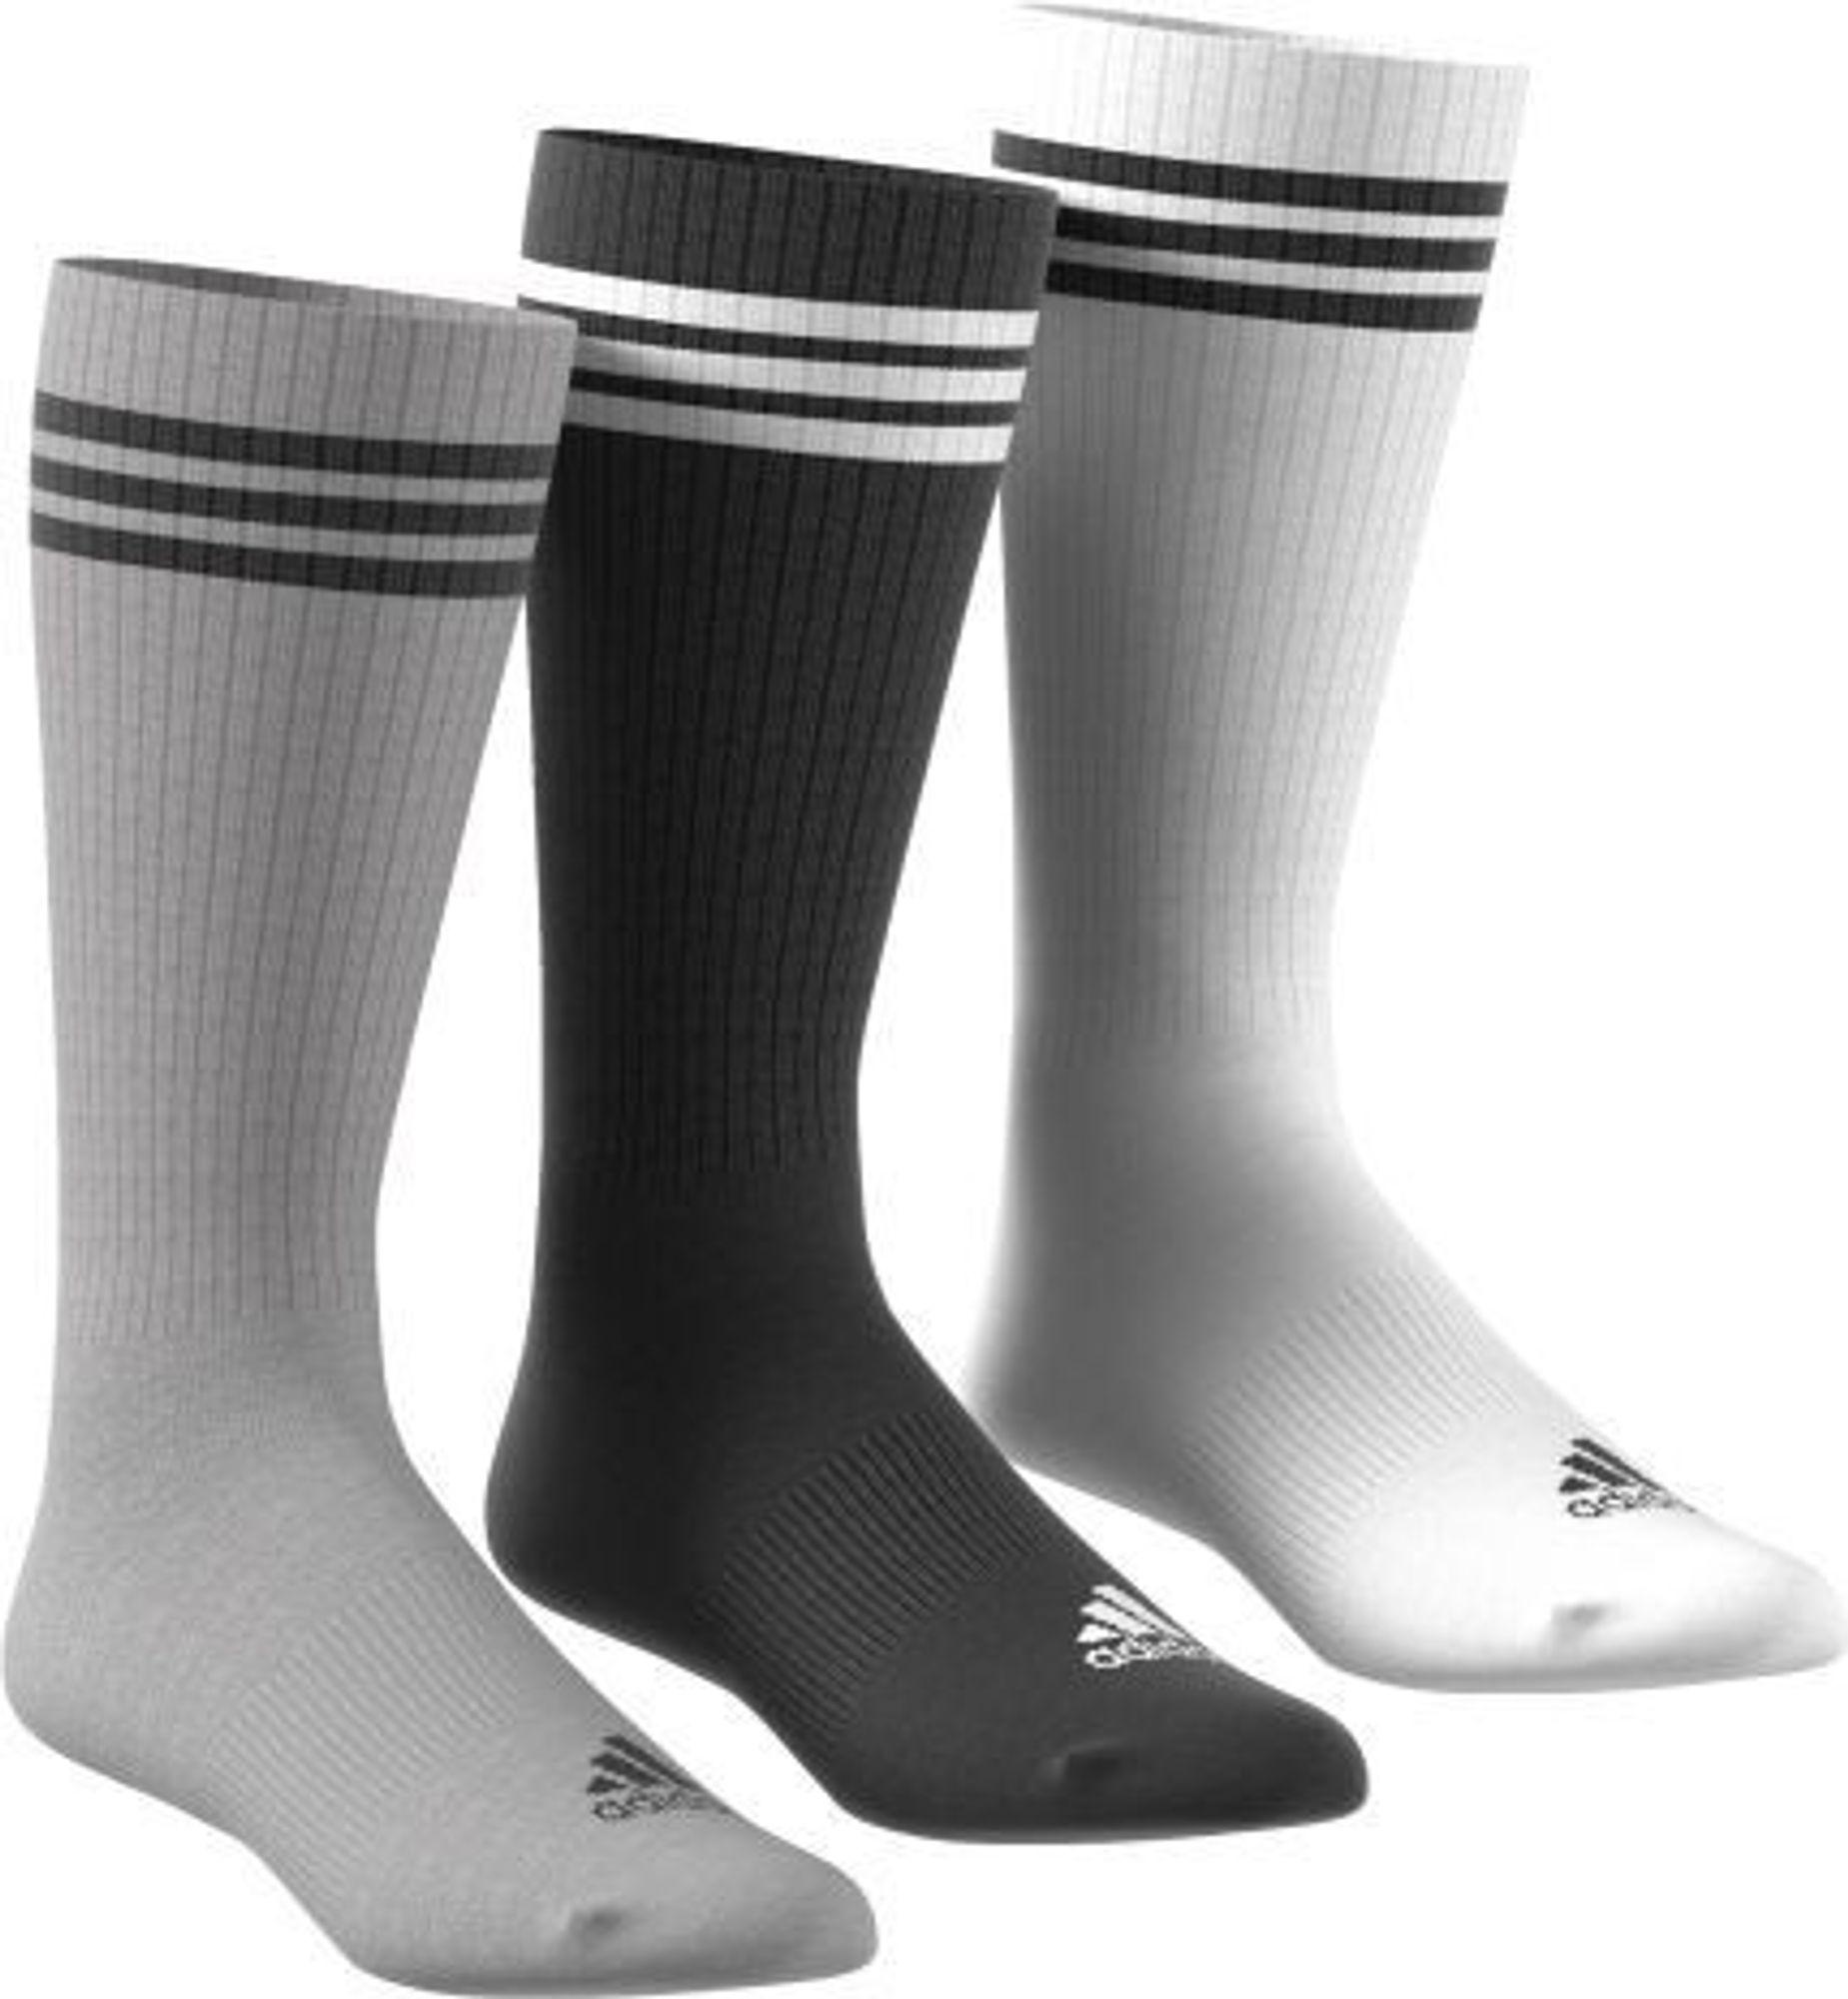 adidas 3S Knee Hc 3Pp - white/black/mgreyh